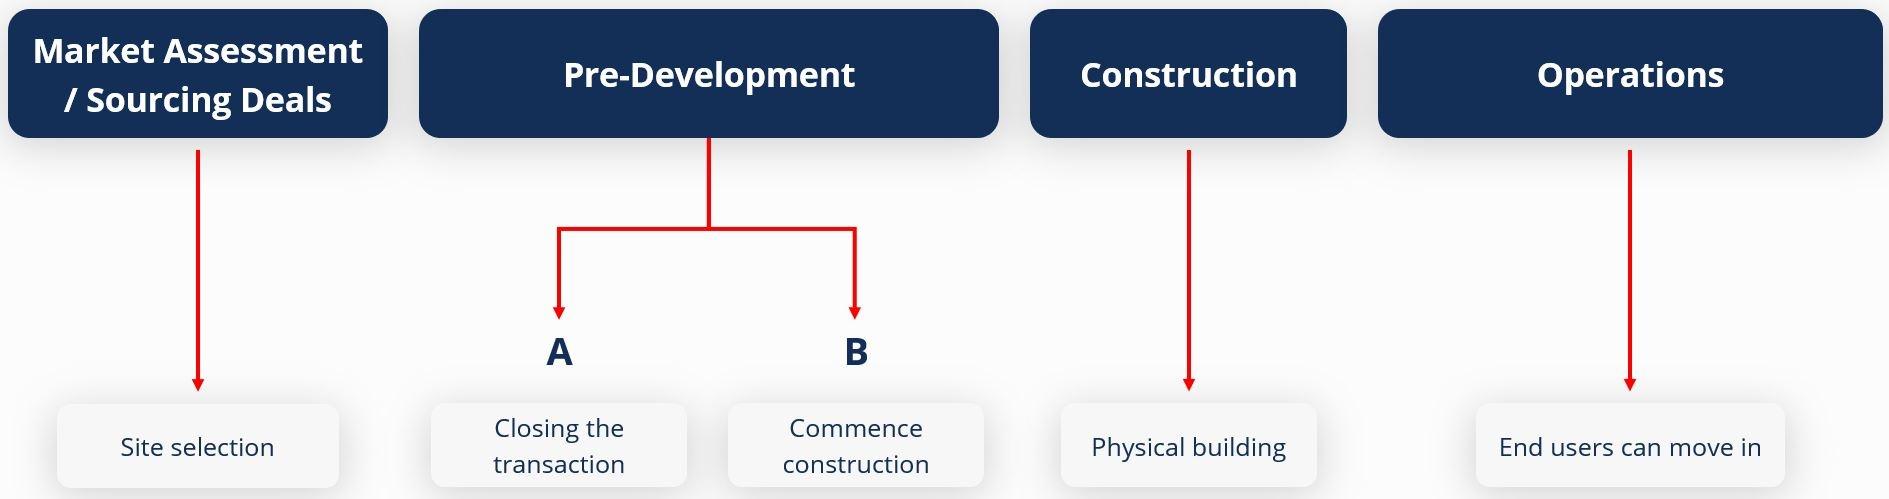 Construction Finance Fundamentals thumbnail